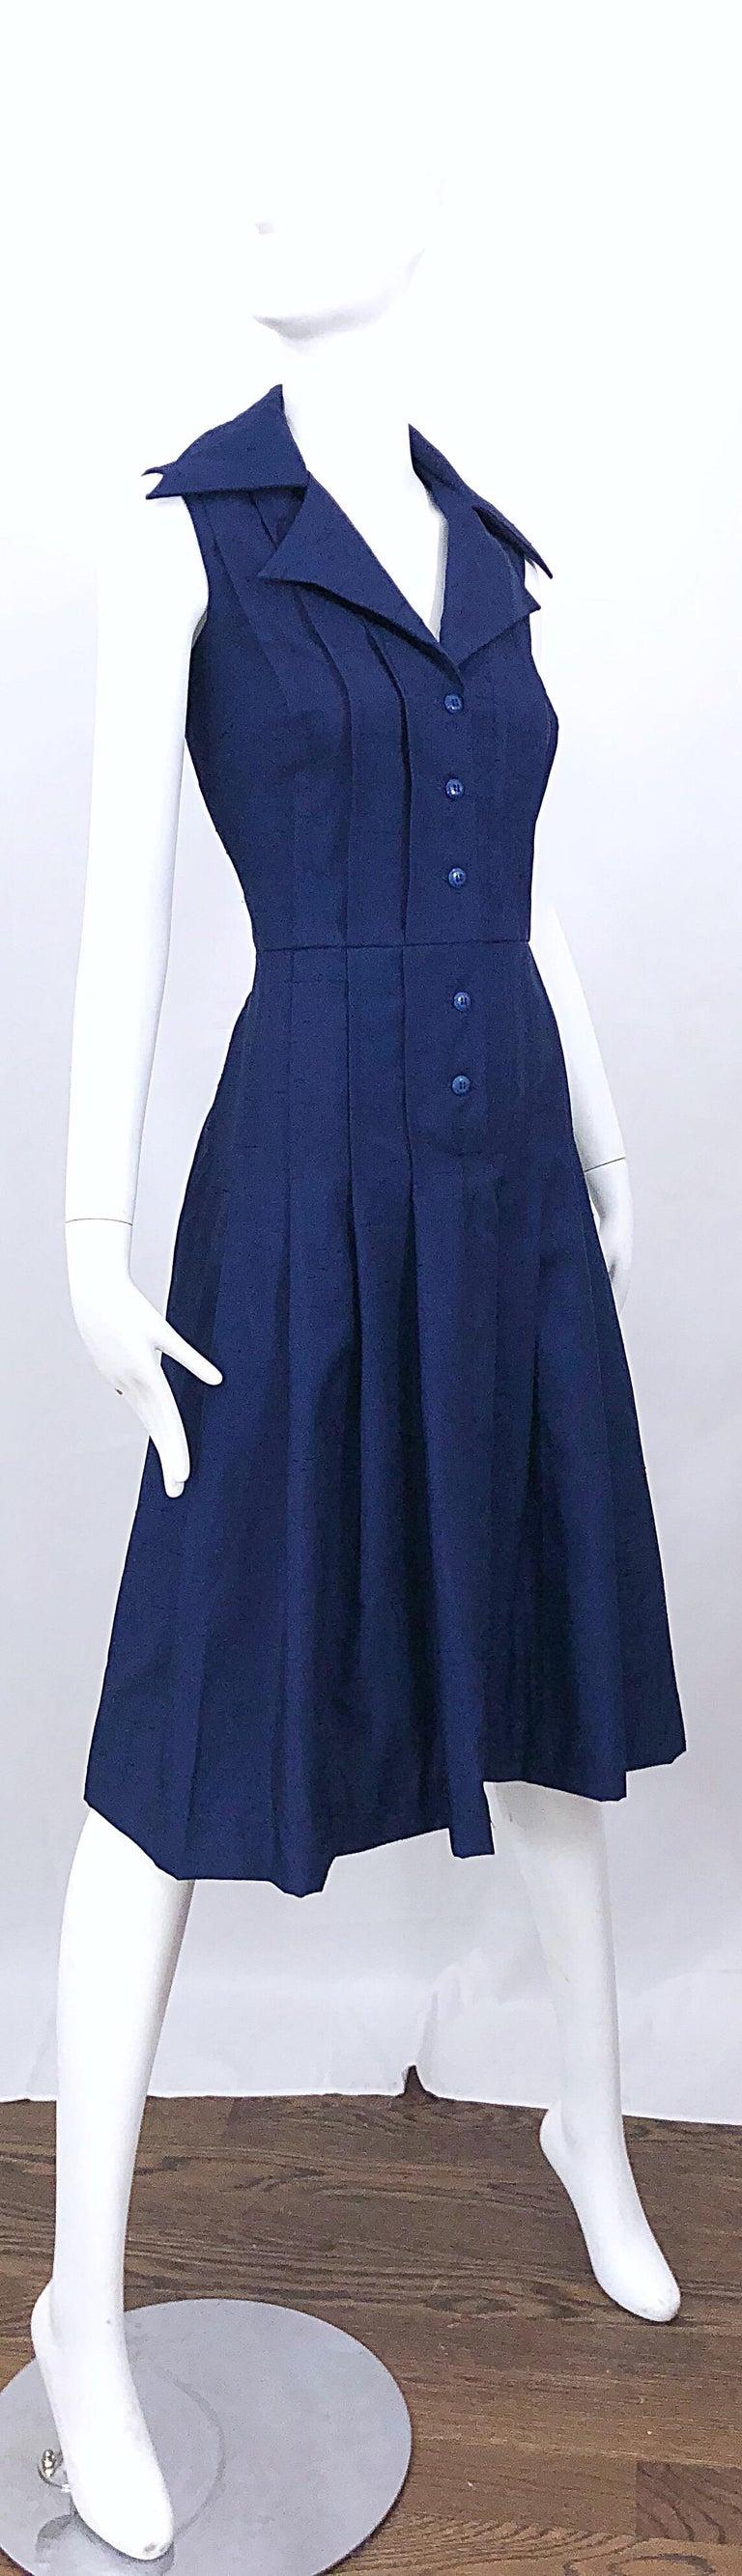 1990s Saks 5th Avenue Size 10 Navy Blue Silk Vintage 90s Sleeveless Shirt Dress For Sale 7